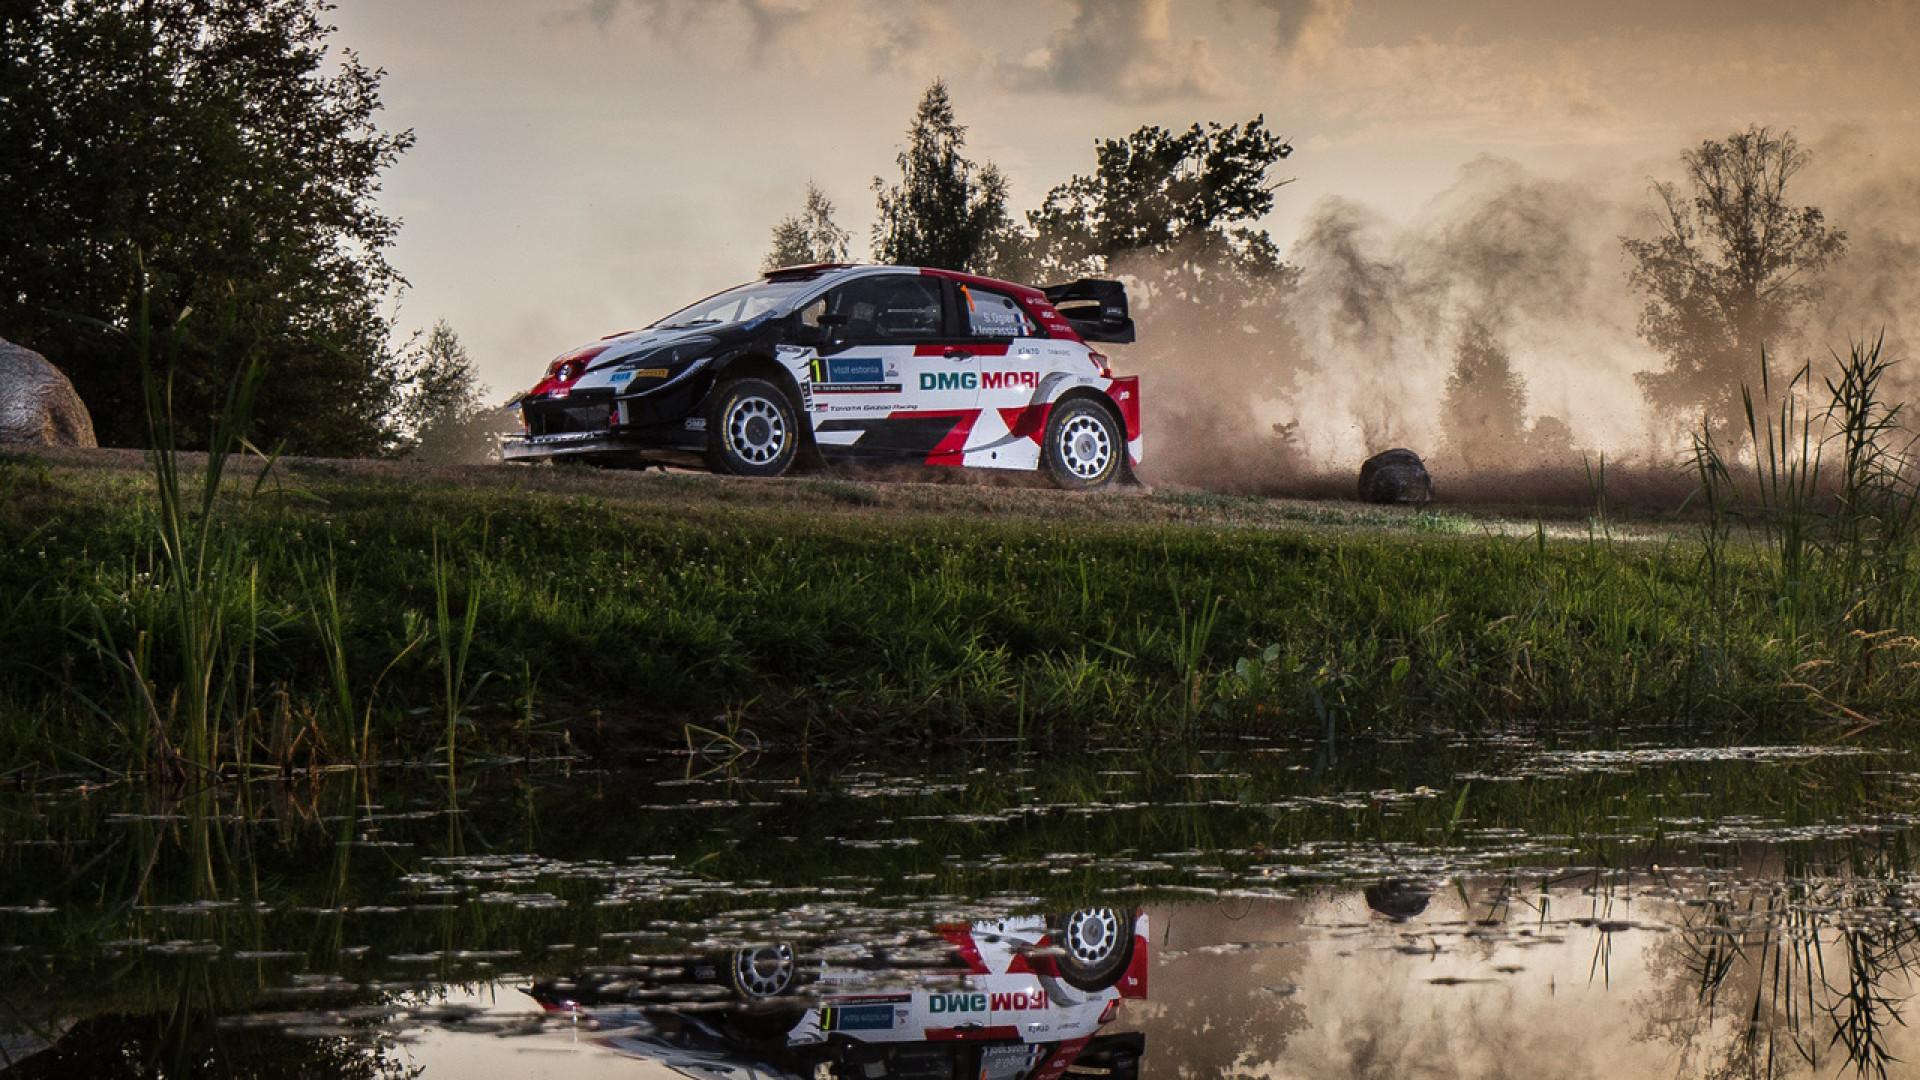 WRC: 11º Rally Estonia [15-18 Julio] - Página 3 160721_AT-Seb-Ogier-Estonia_01